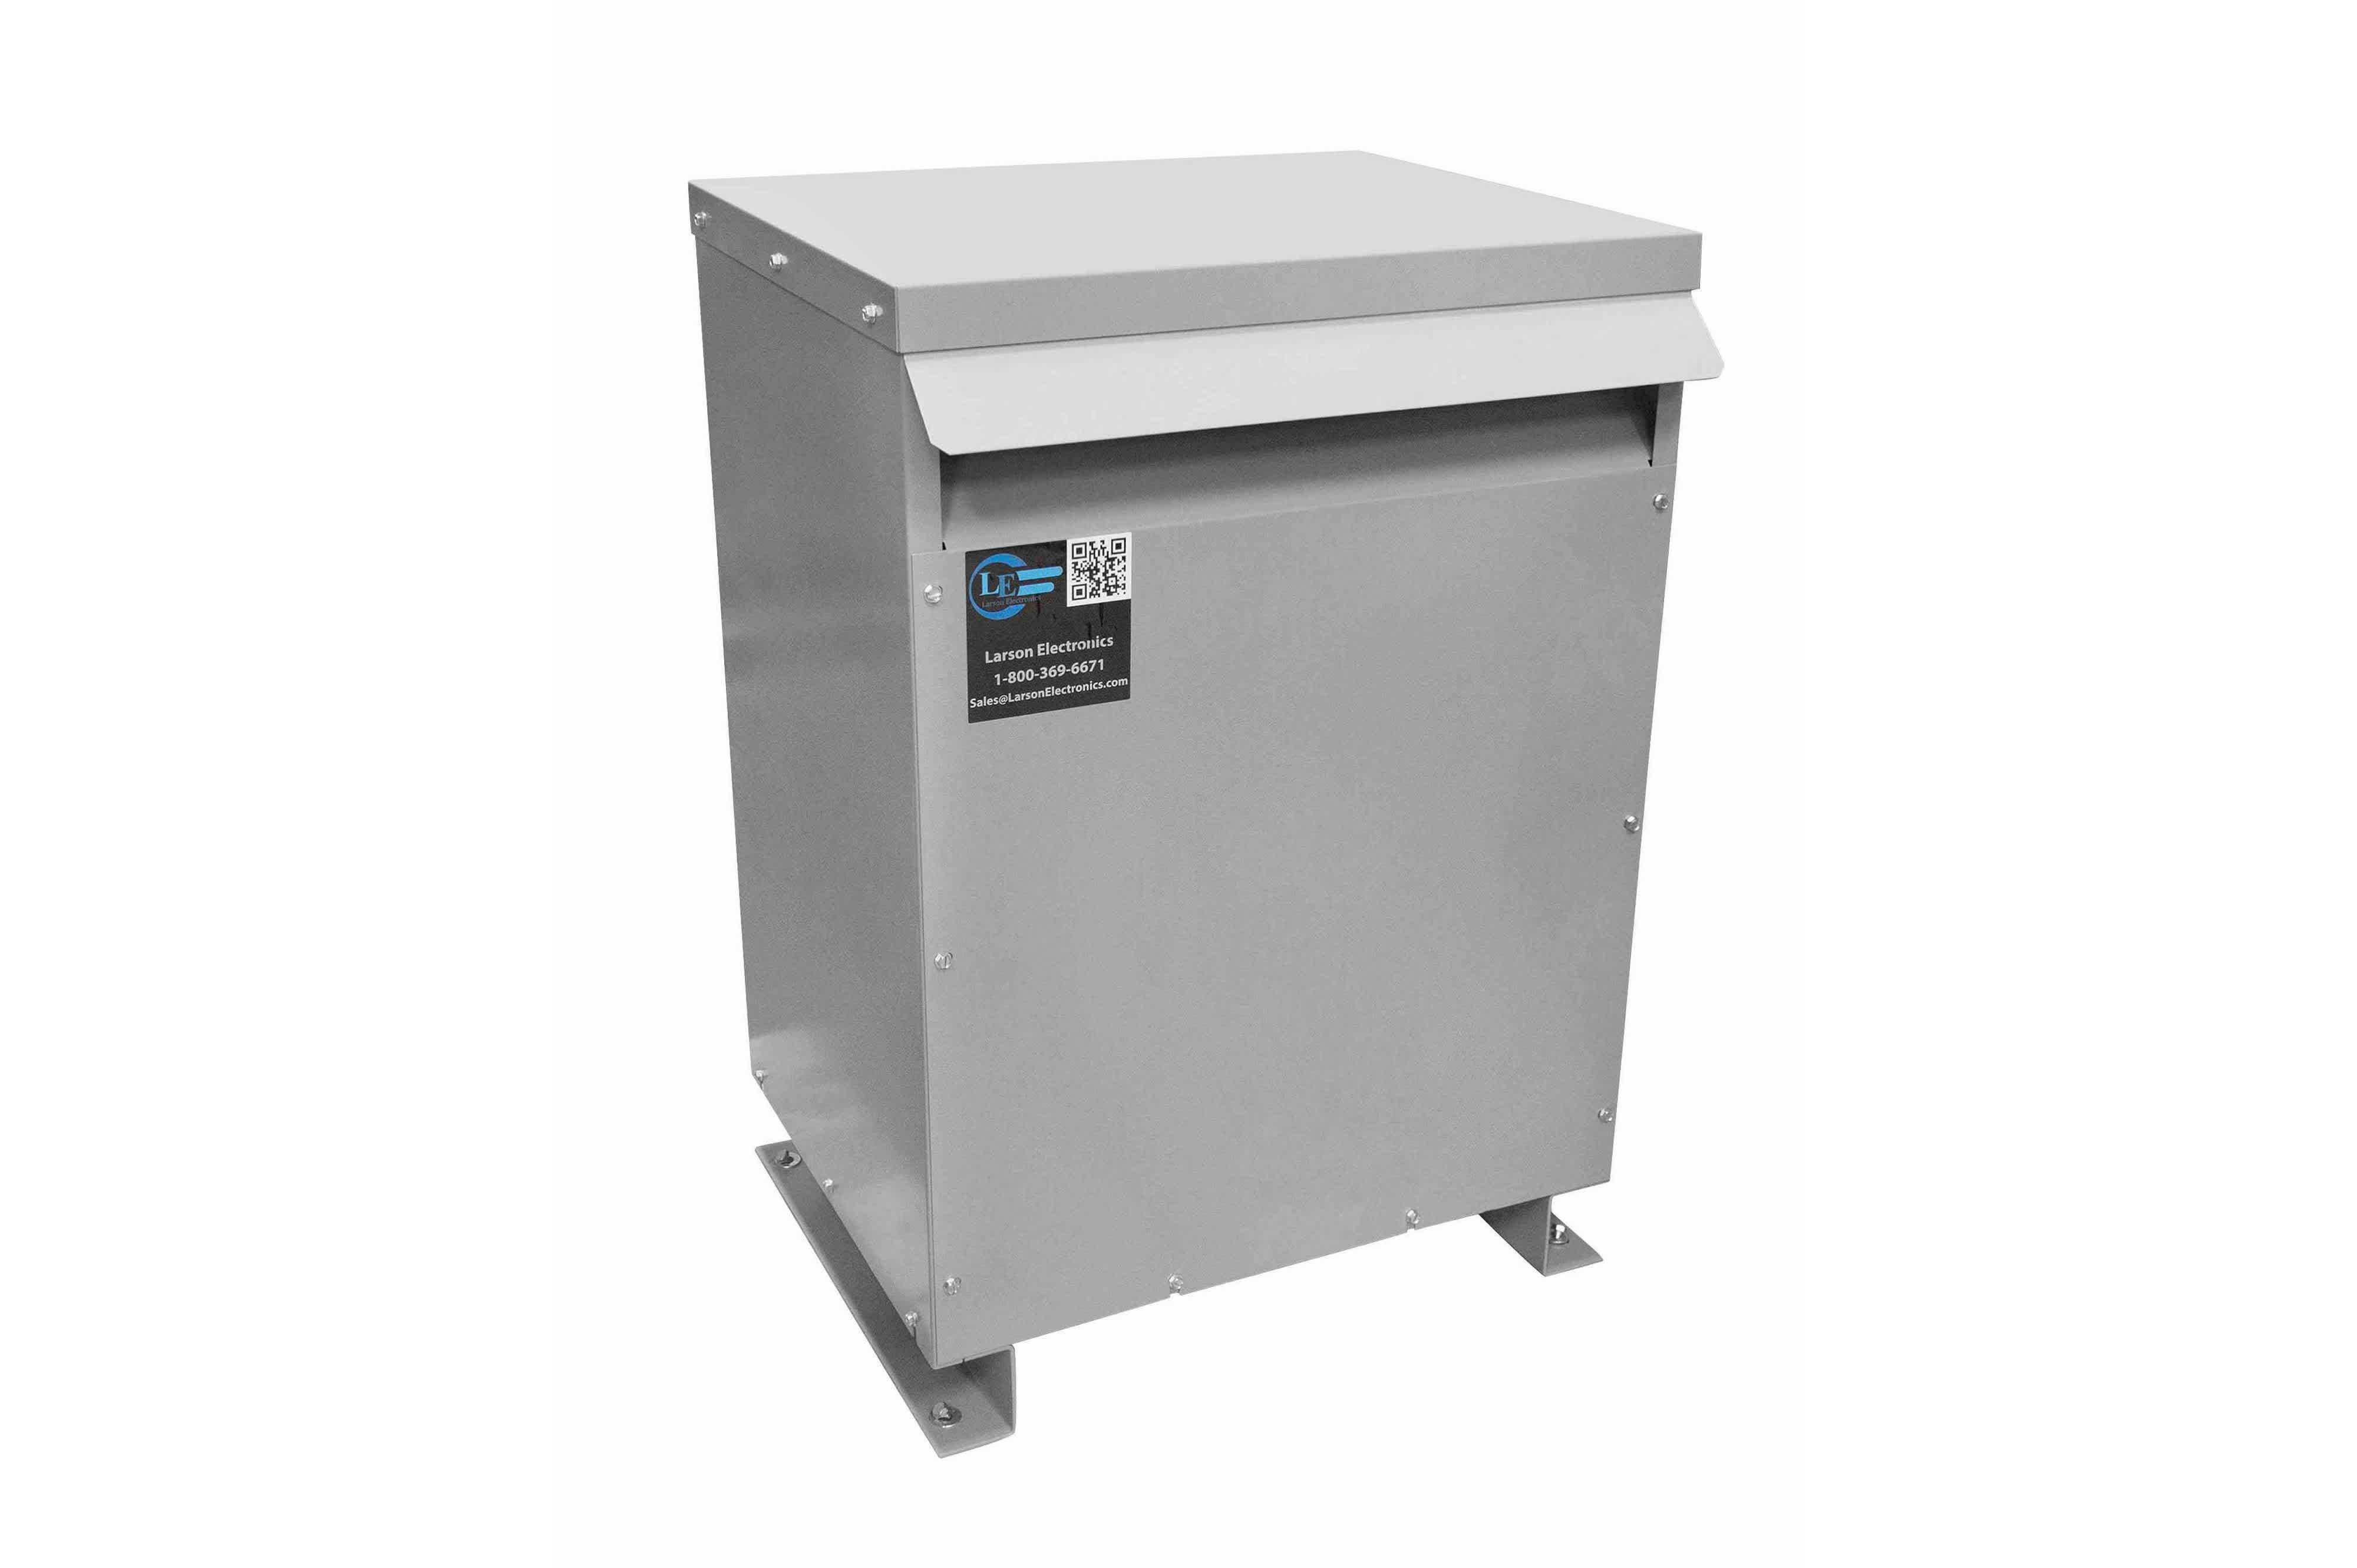 9 kVA 3PH Isolation Transformer, 208V Wye Primary, 400Y/231 Wye-N Secondary, N3R, Ventilated, 60 Hz